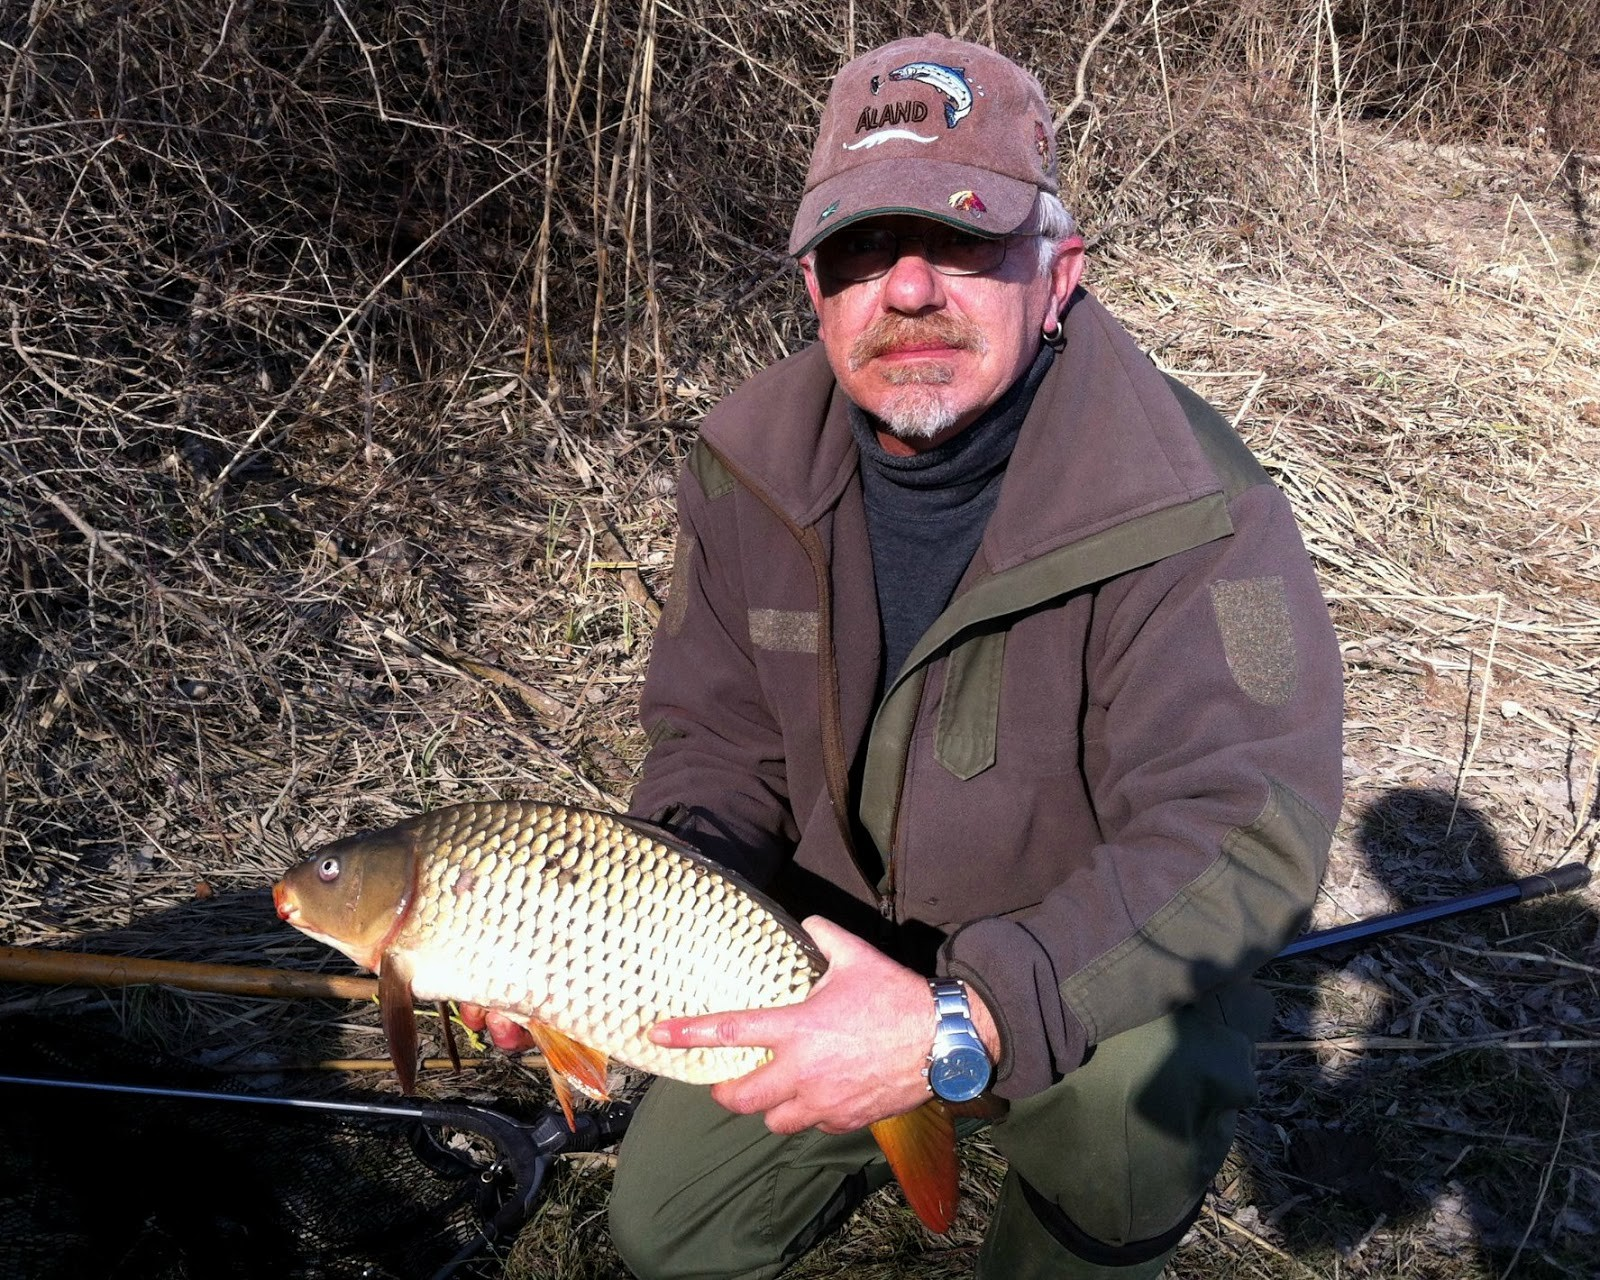 Peter Fikinger - Karpfen - 3,0kg - 03.03.2013 - Revier III